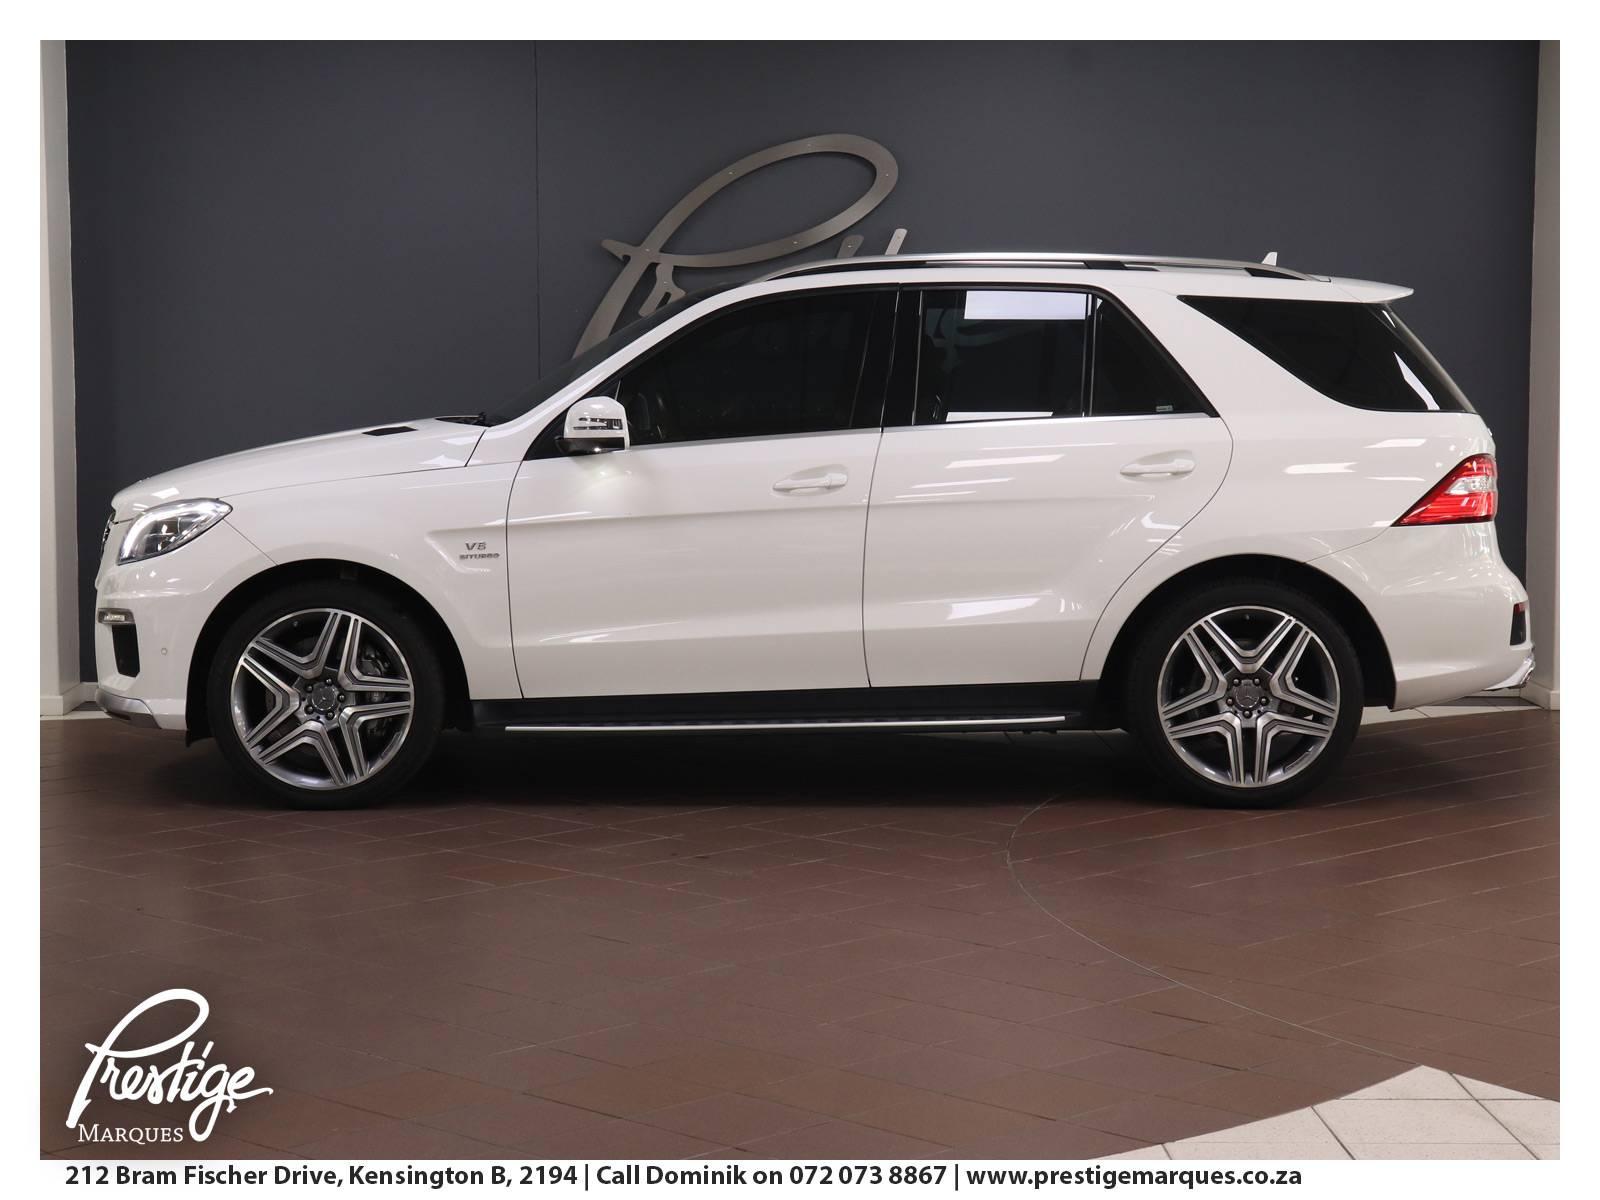 2015-Mercedes-Benz-ML63-AMG-Prestige-Marques-Randburg-Sandton-5